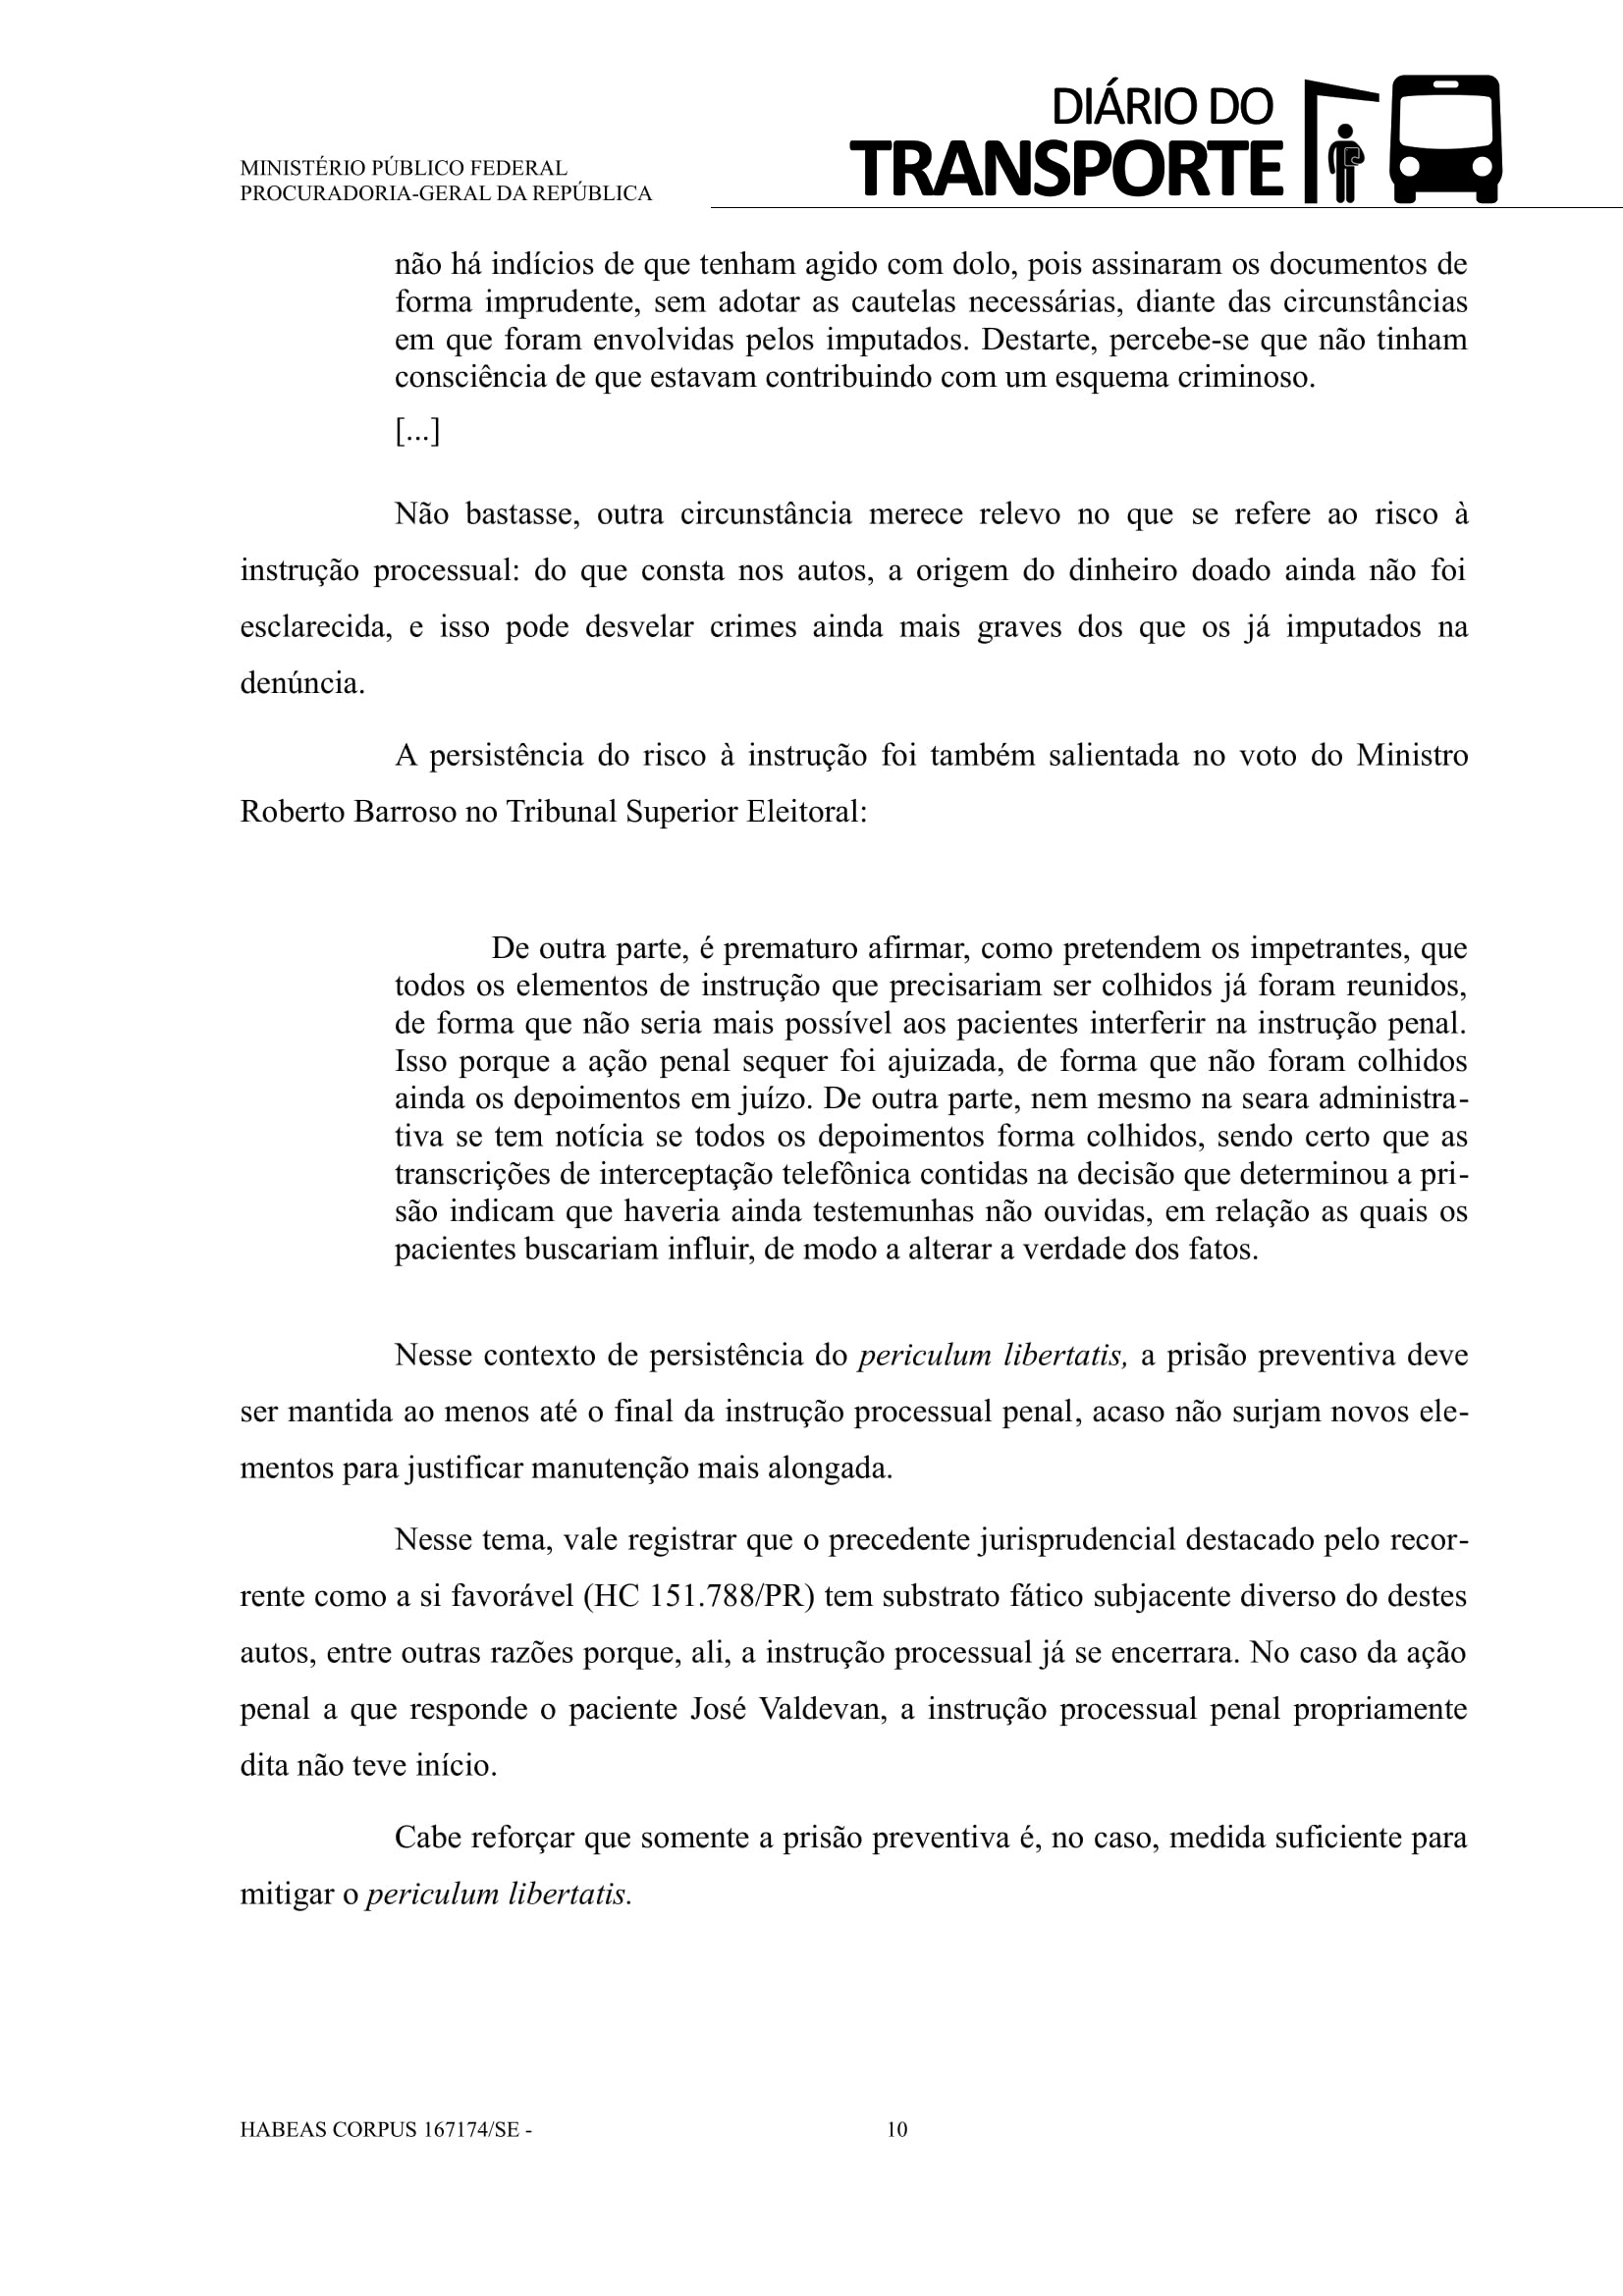 HC 167174_ContrarrazoesAgravo_Jose Valdevan de Jesus Santos-10